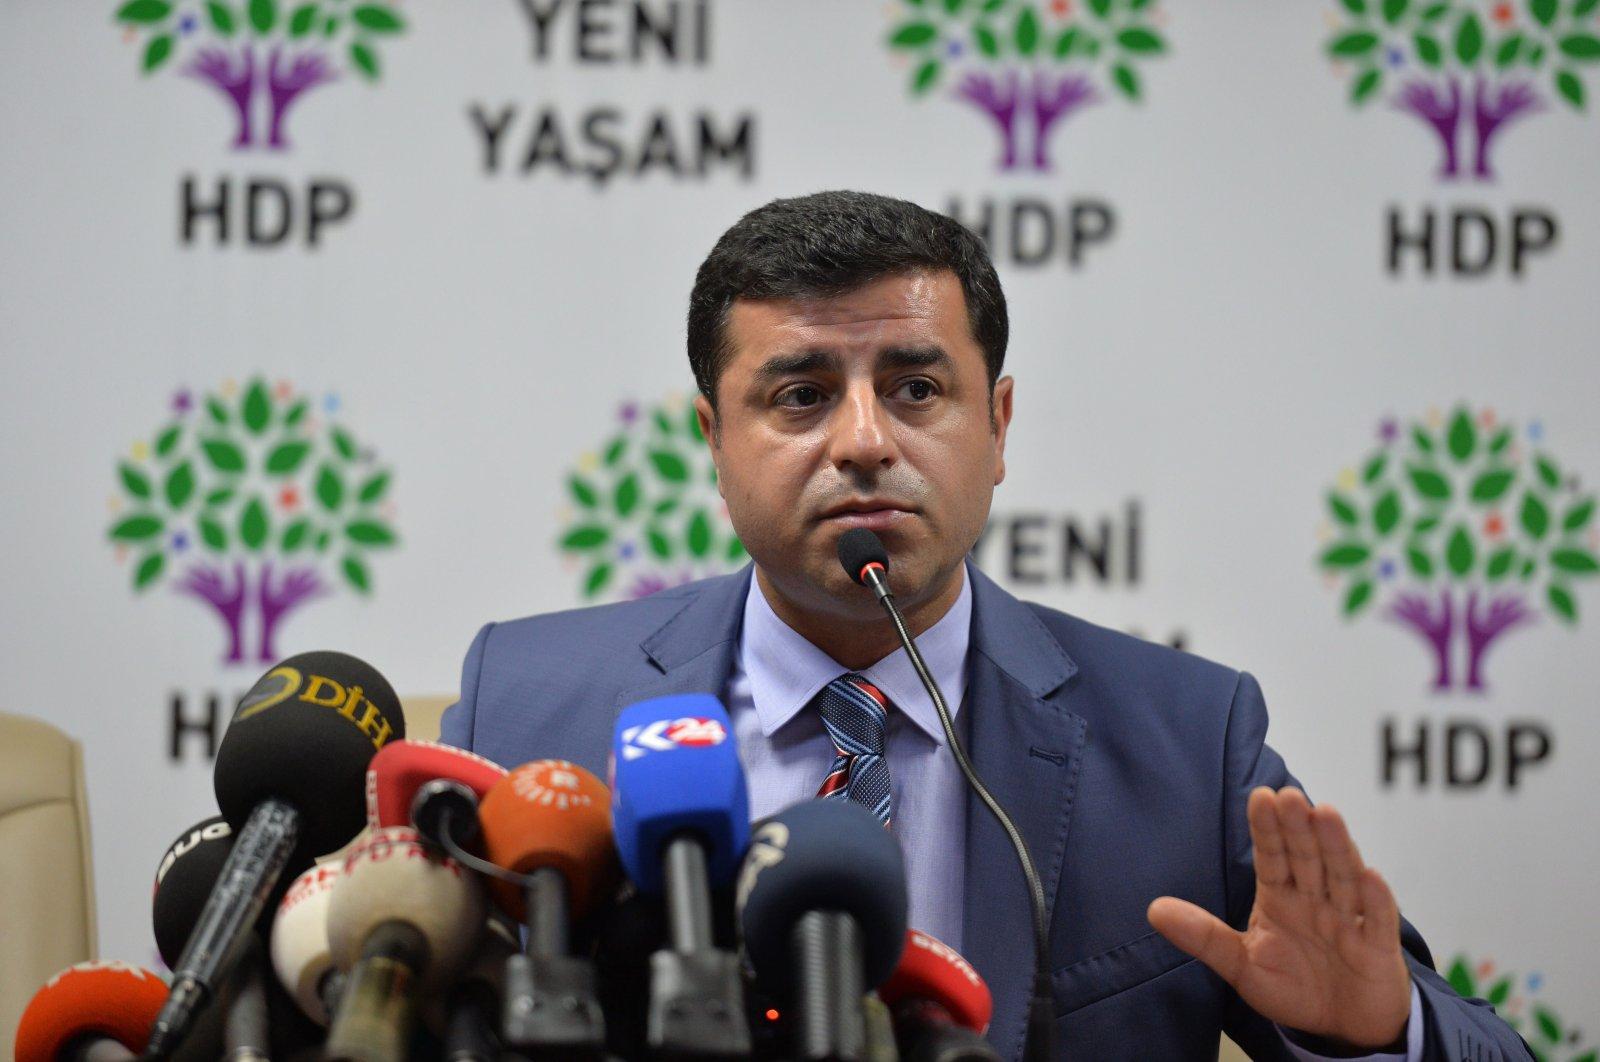 Former HDP Co-chair Selahaddin Demirtaş. (PHOTO BY ALI EKEYILMAZ)